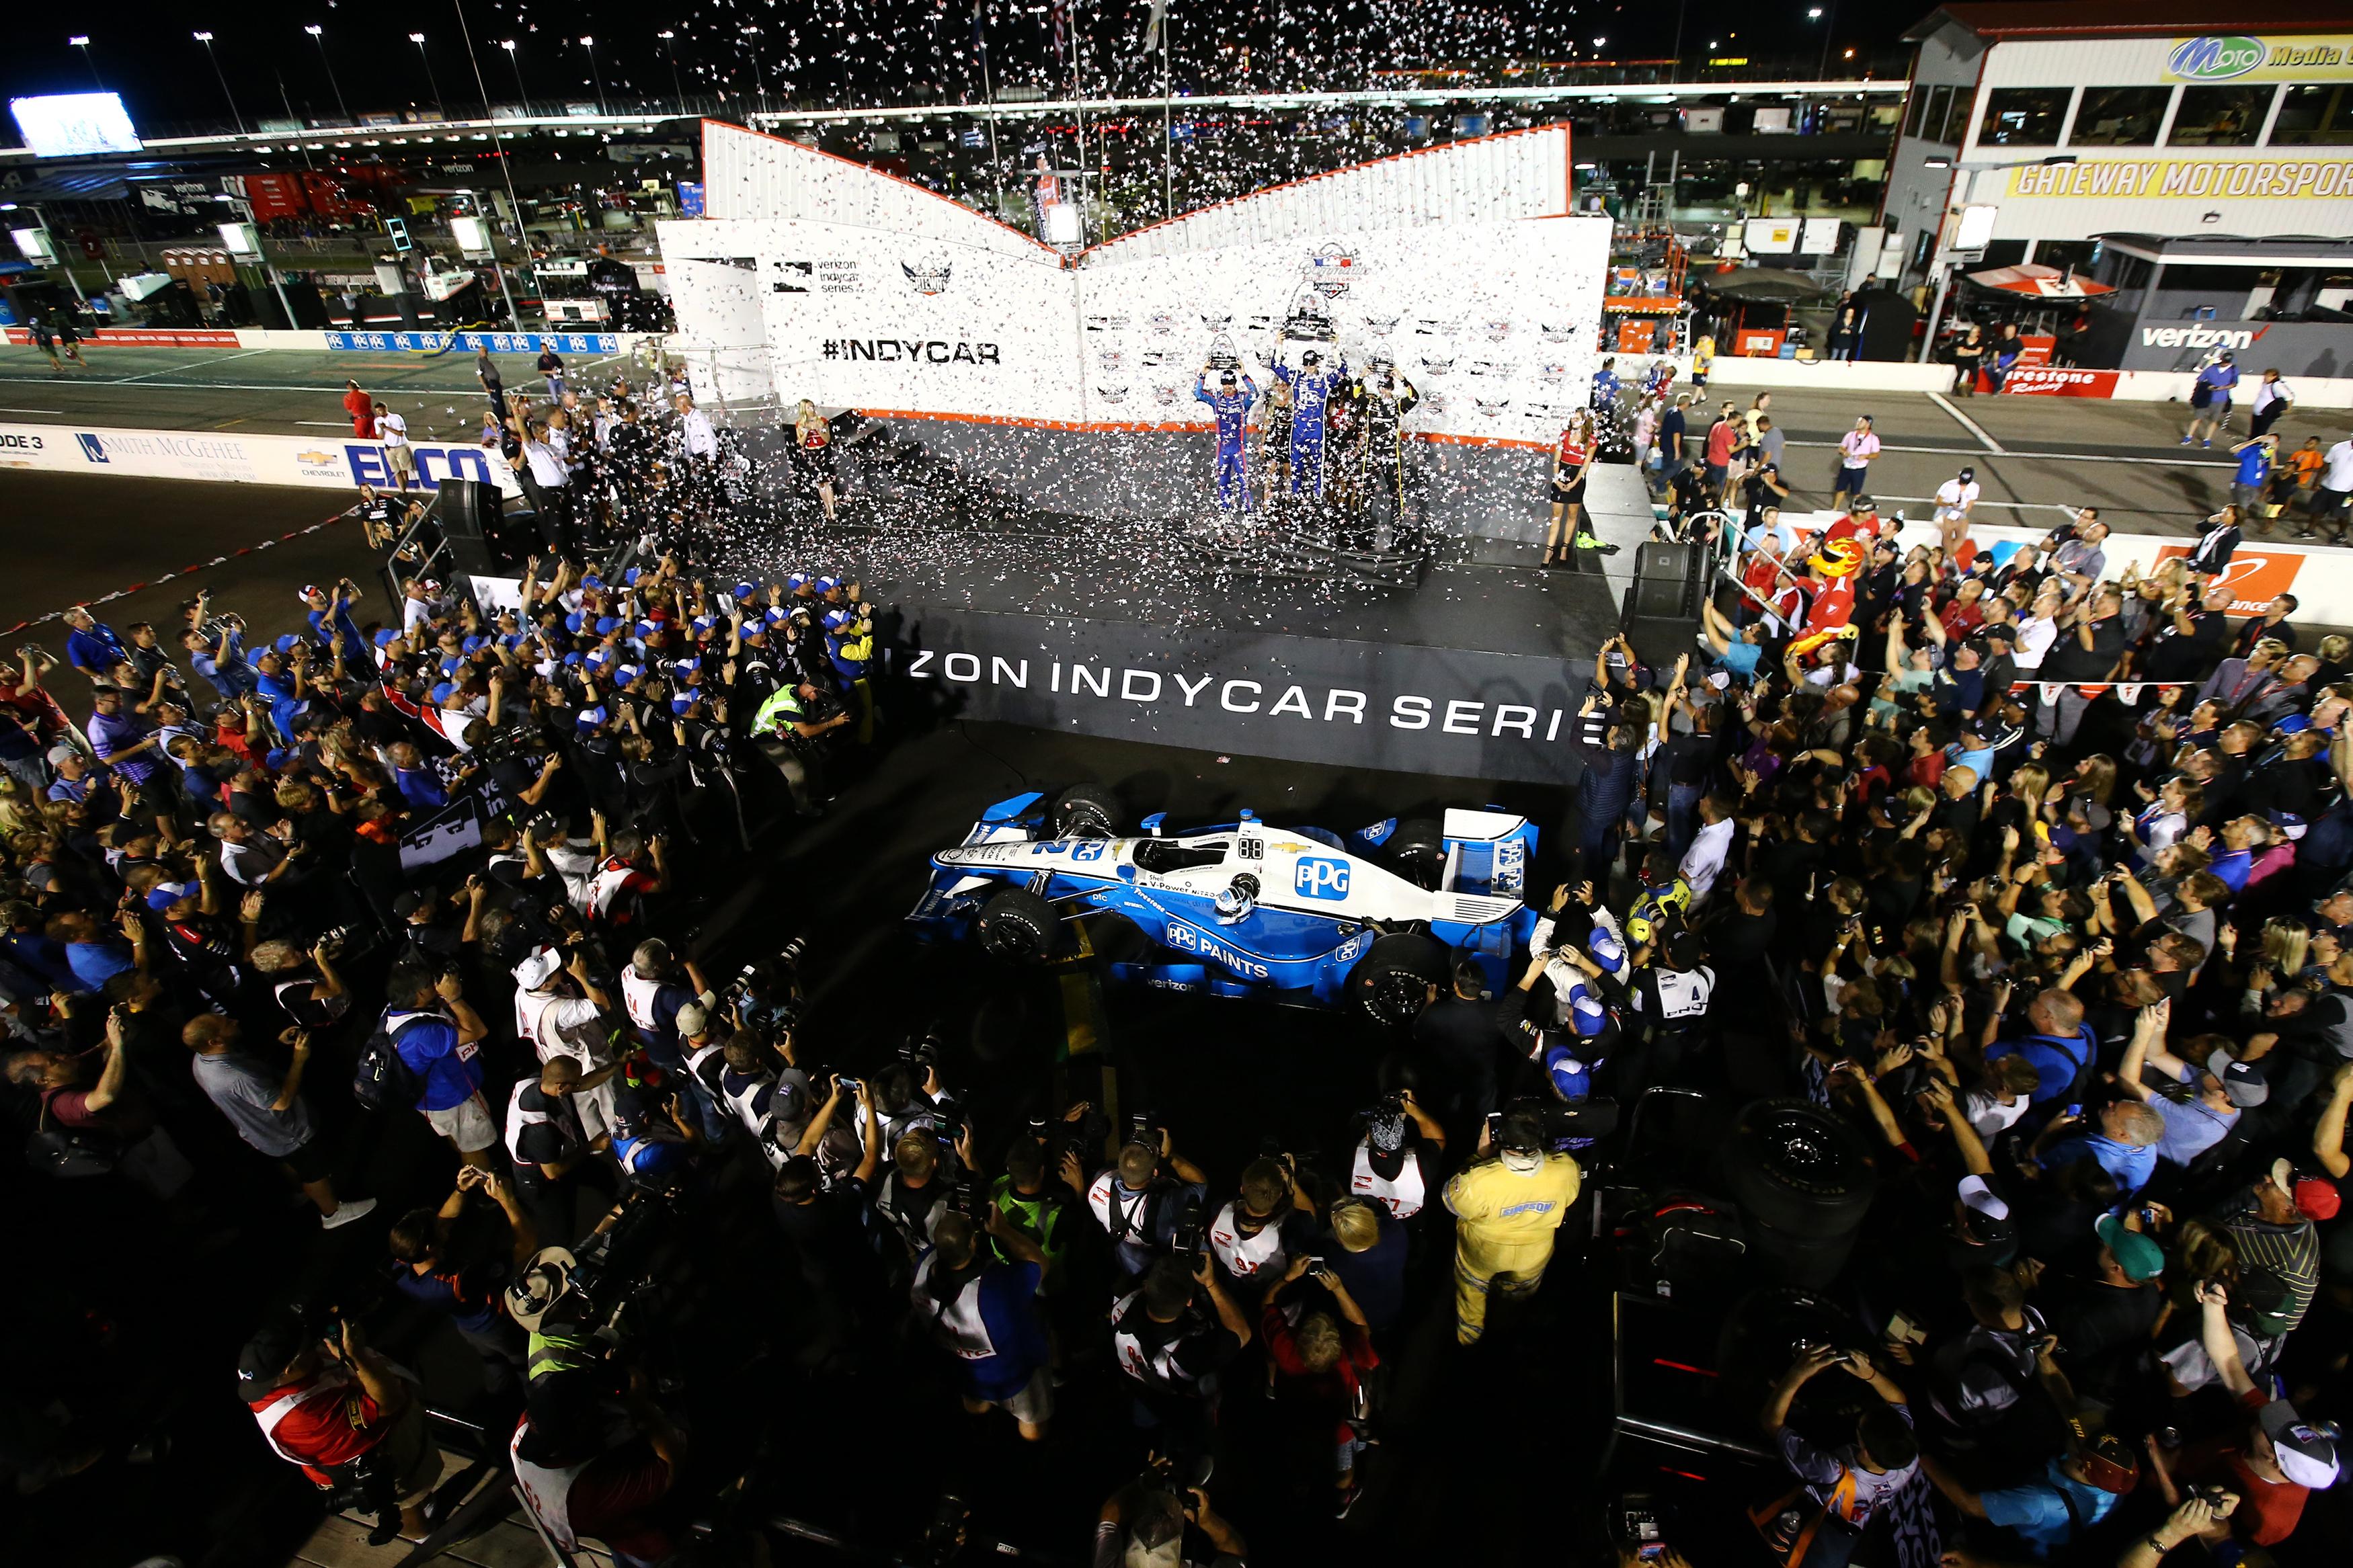 Josef Newgarden wins at Gateway Motorsports Park